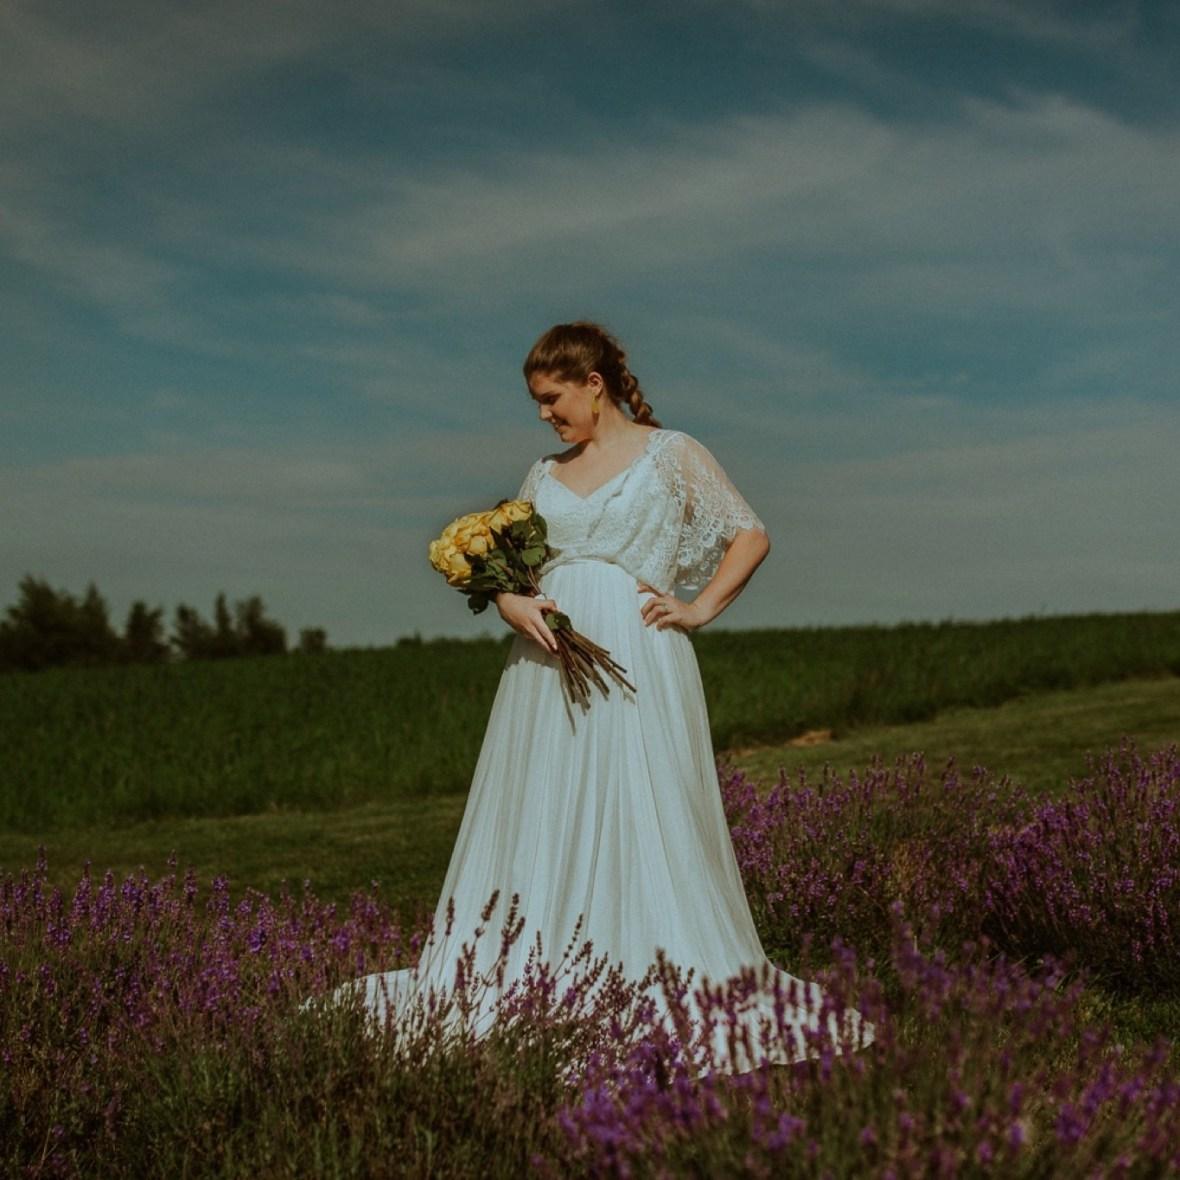 05_WCTM3466ab_Lavender_Farm_Phillips_Clothier_Wedding_Kimberly